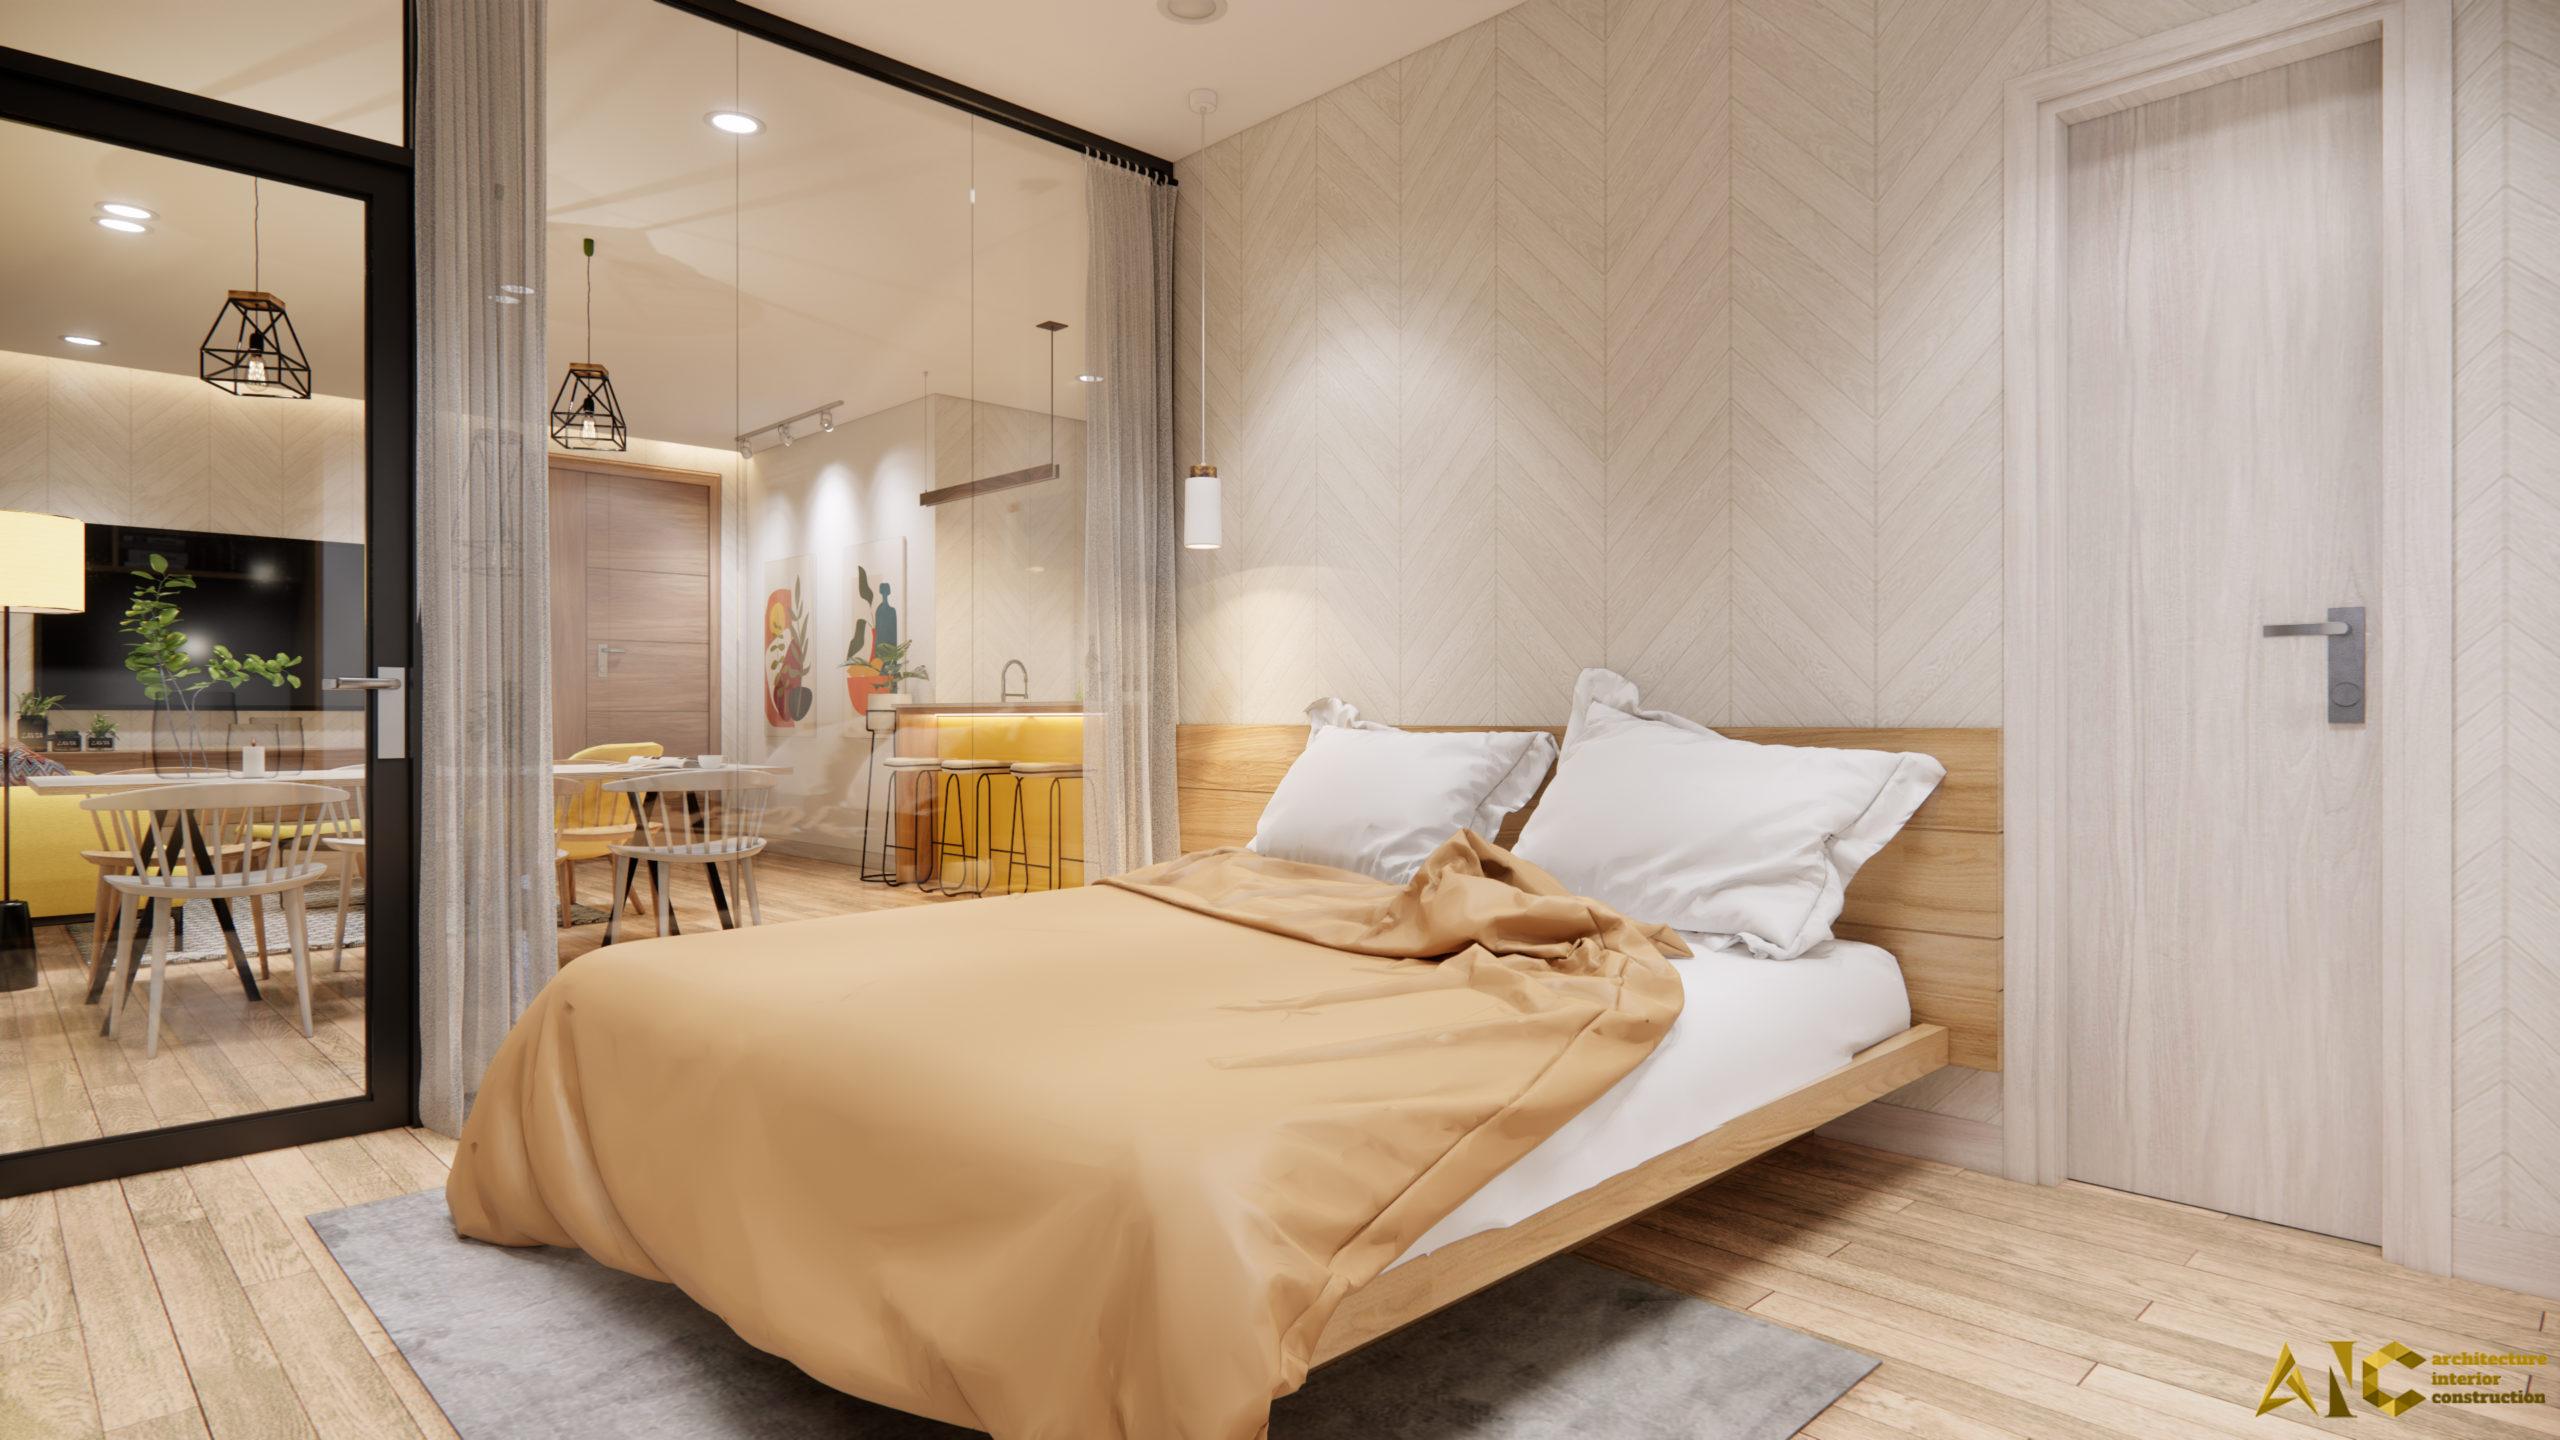 thiết kế căn hộ him lam (24)